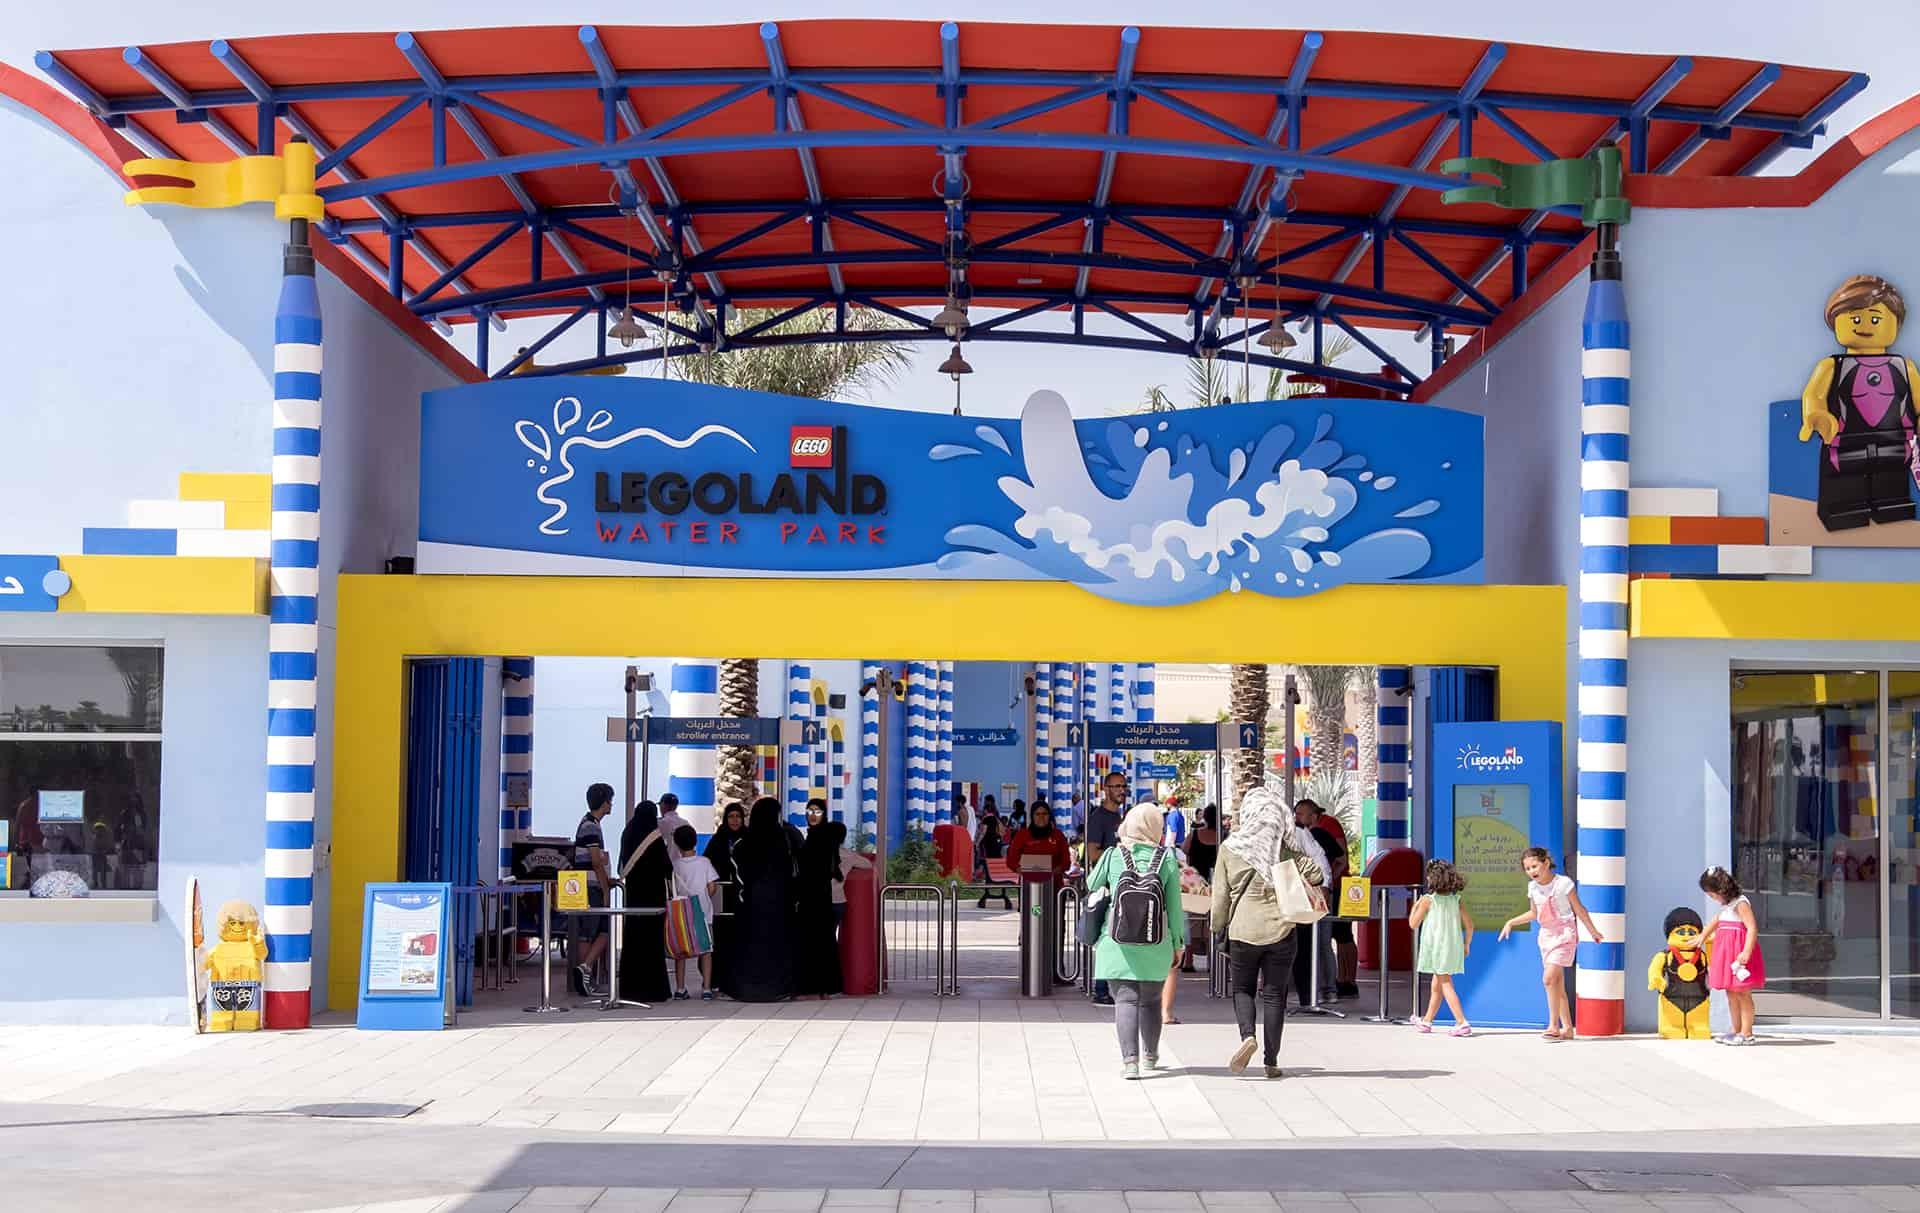 tourisme parc aquatique legoland